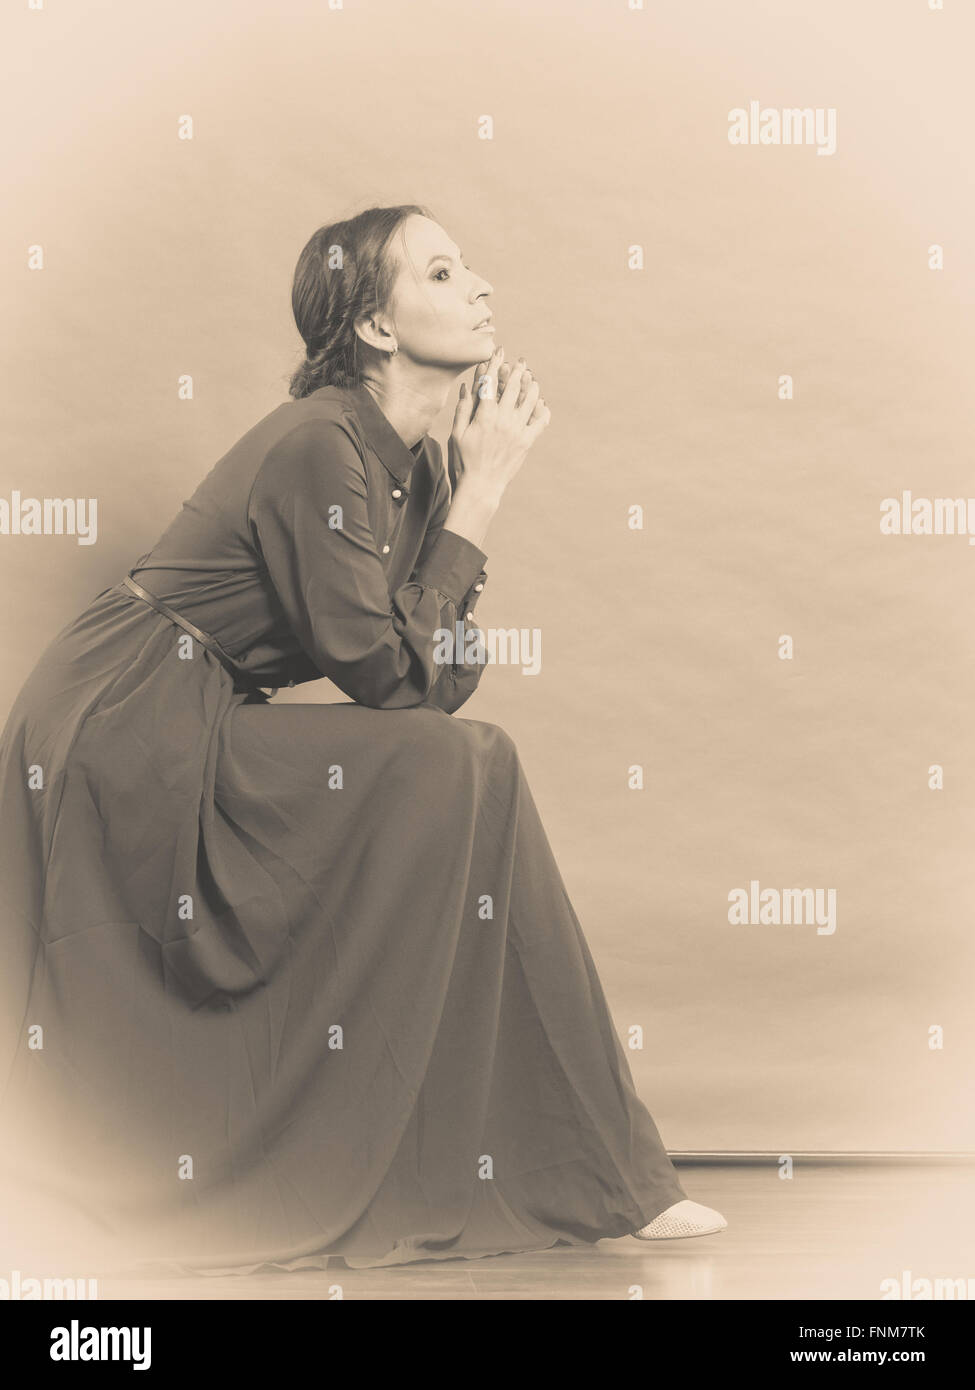 Sad Woman Retro Style Portrait Long Dark Gown Vintage Photo Sepia Toned